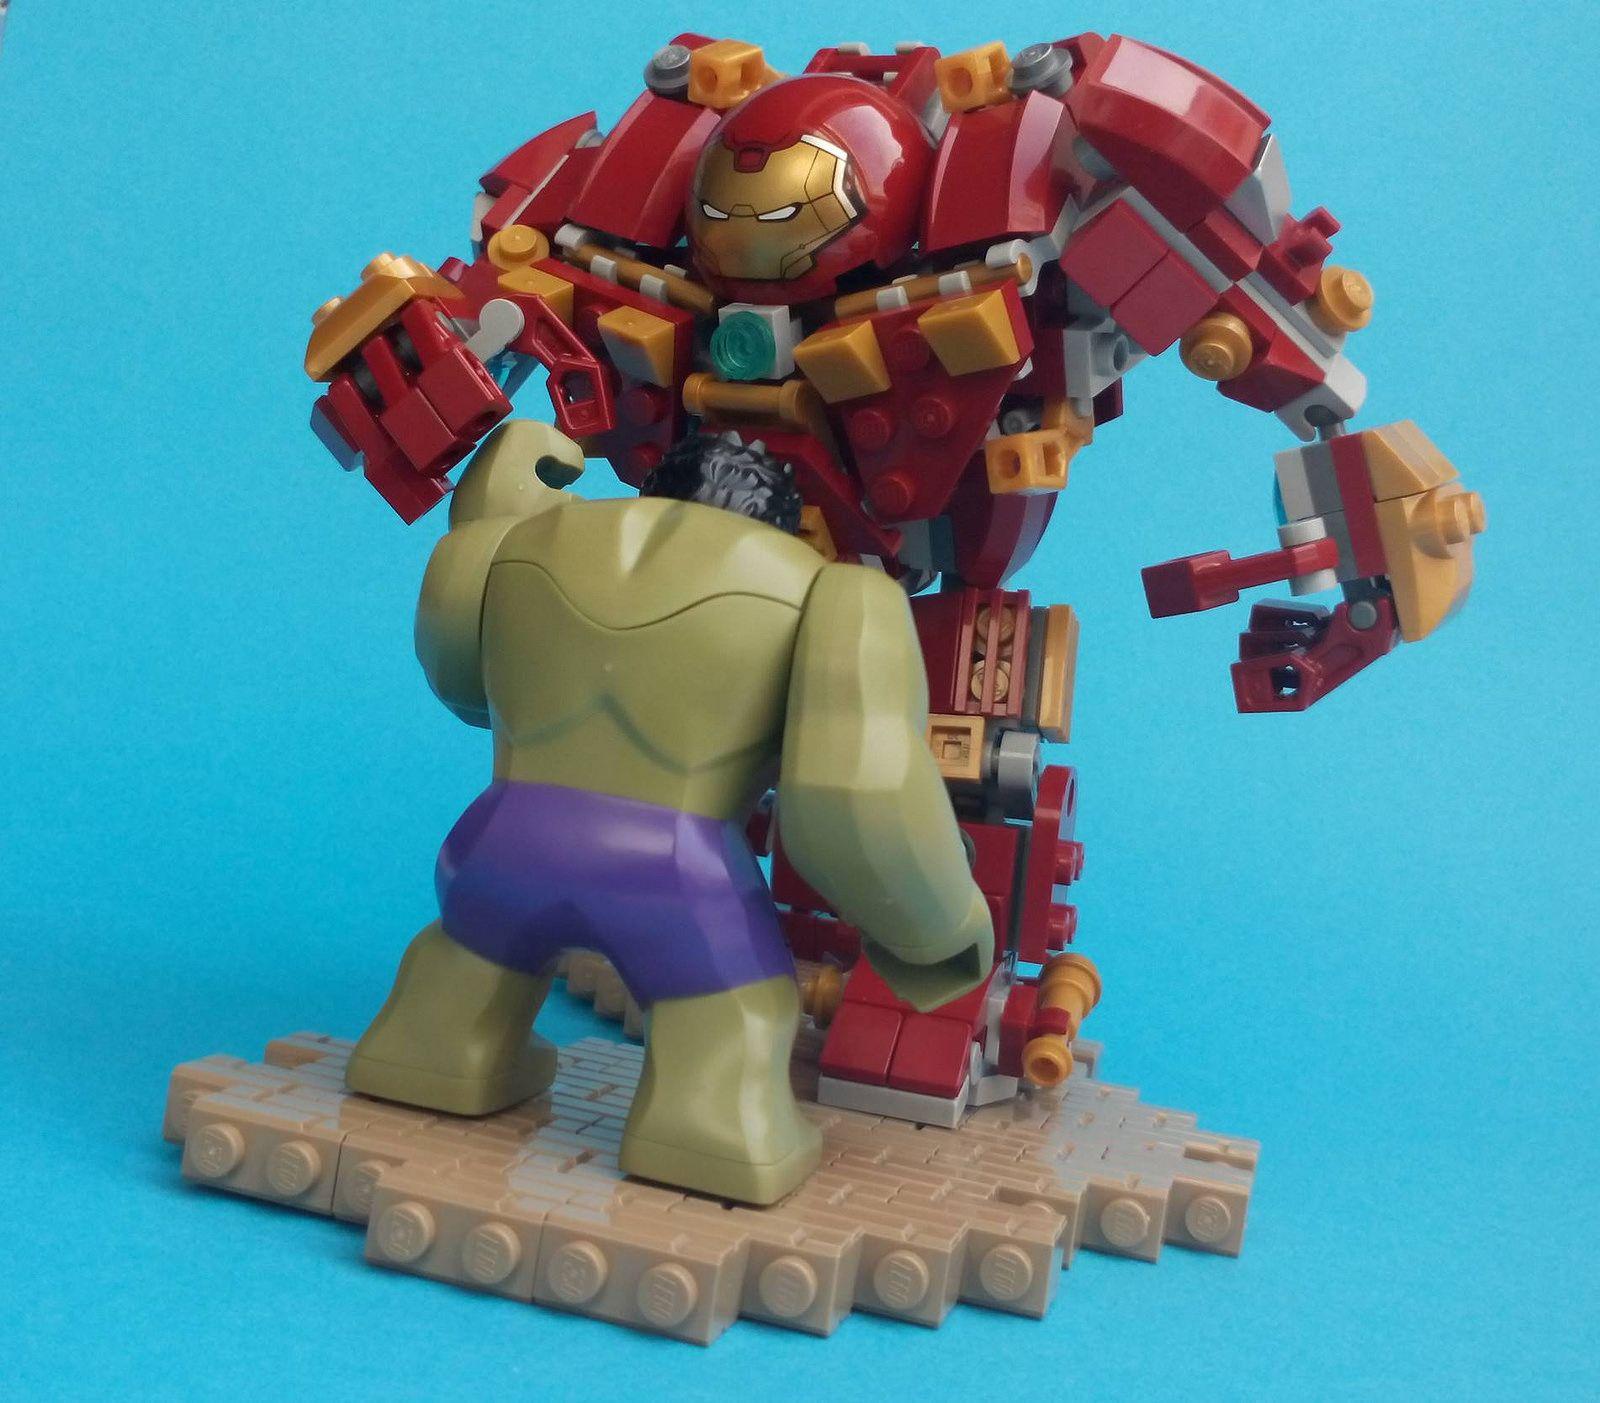 LEGO Avengers: Age Of Ultron - Hulk Vs. Hulkbuster ...